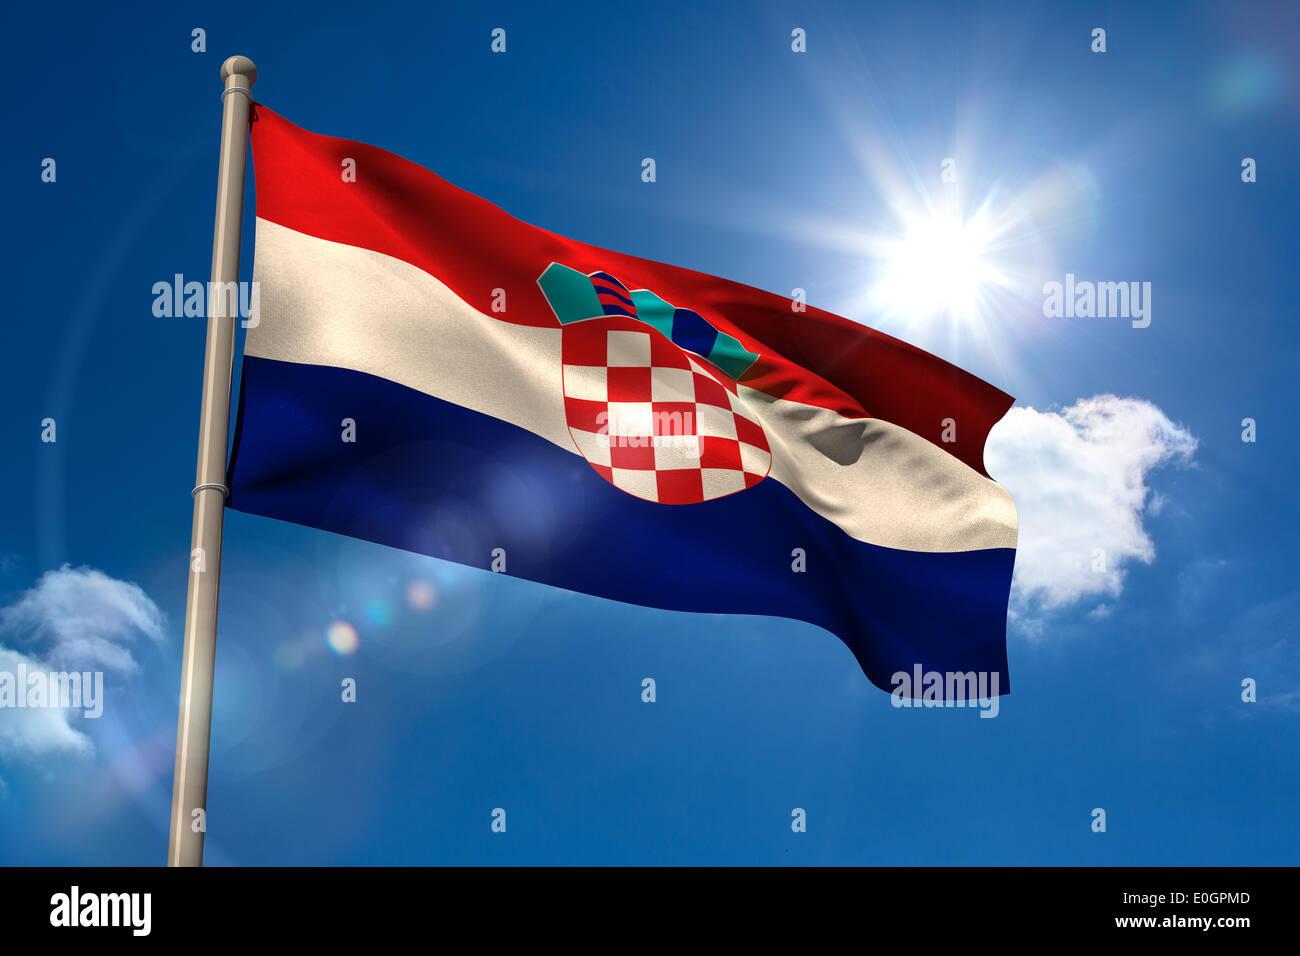 Croatia national flag on flagpole - Stock Image